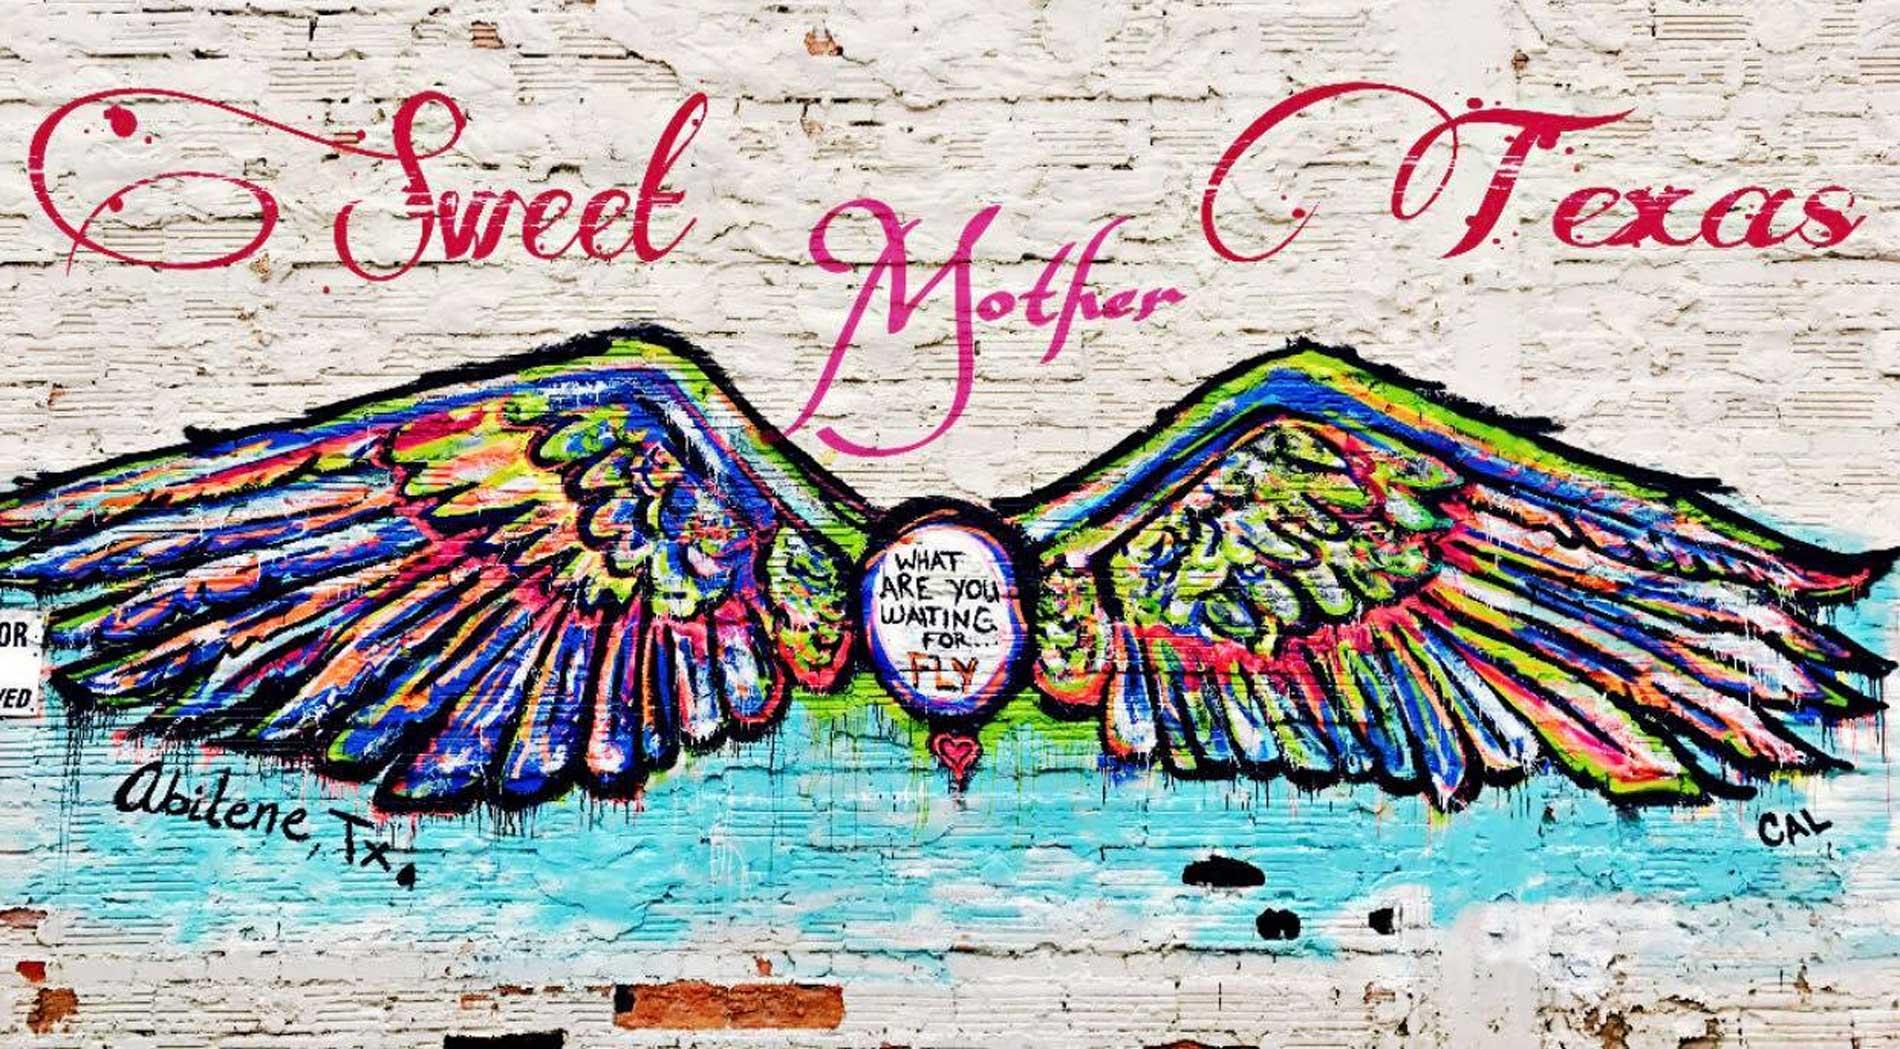 Sweet Mother Texas - mural logo